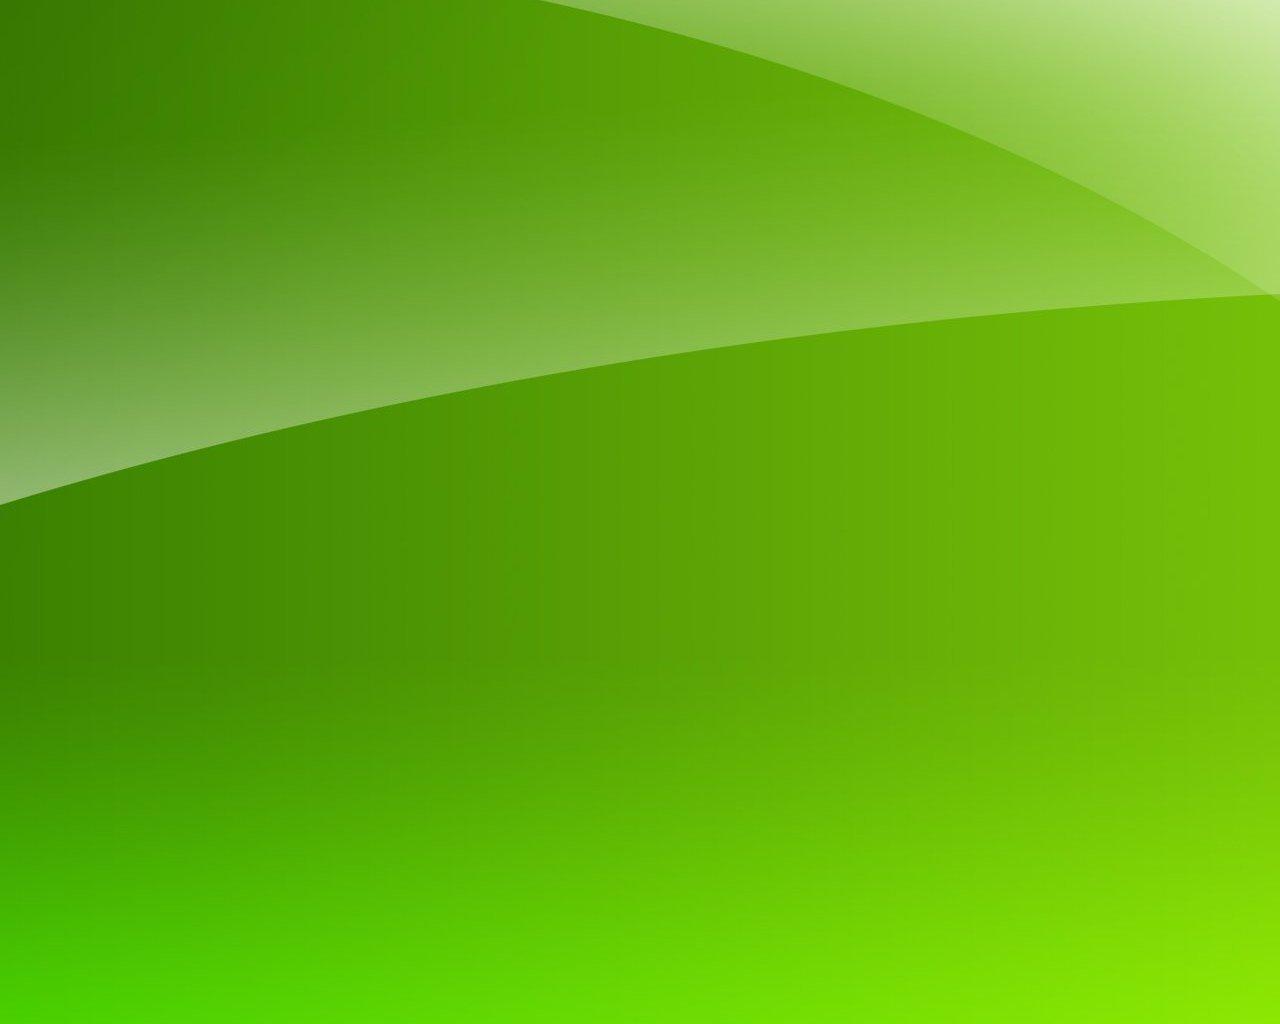 Simple Green - Green W...